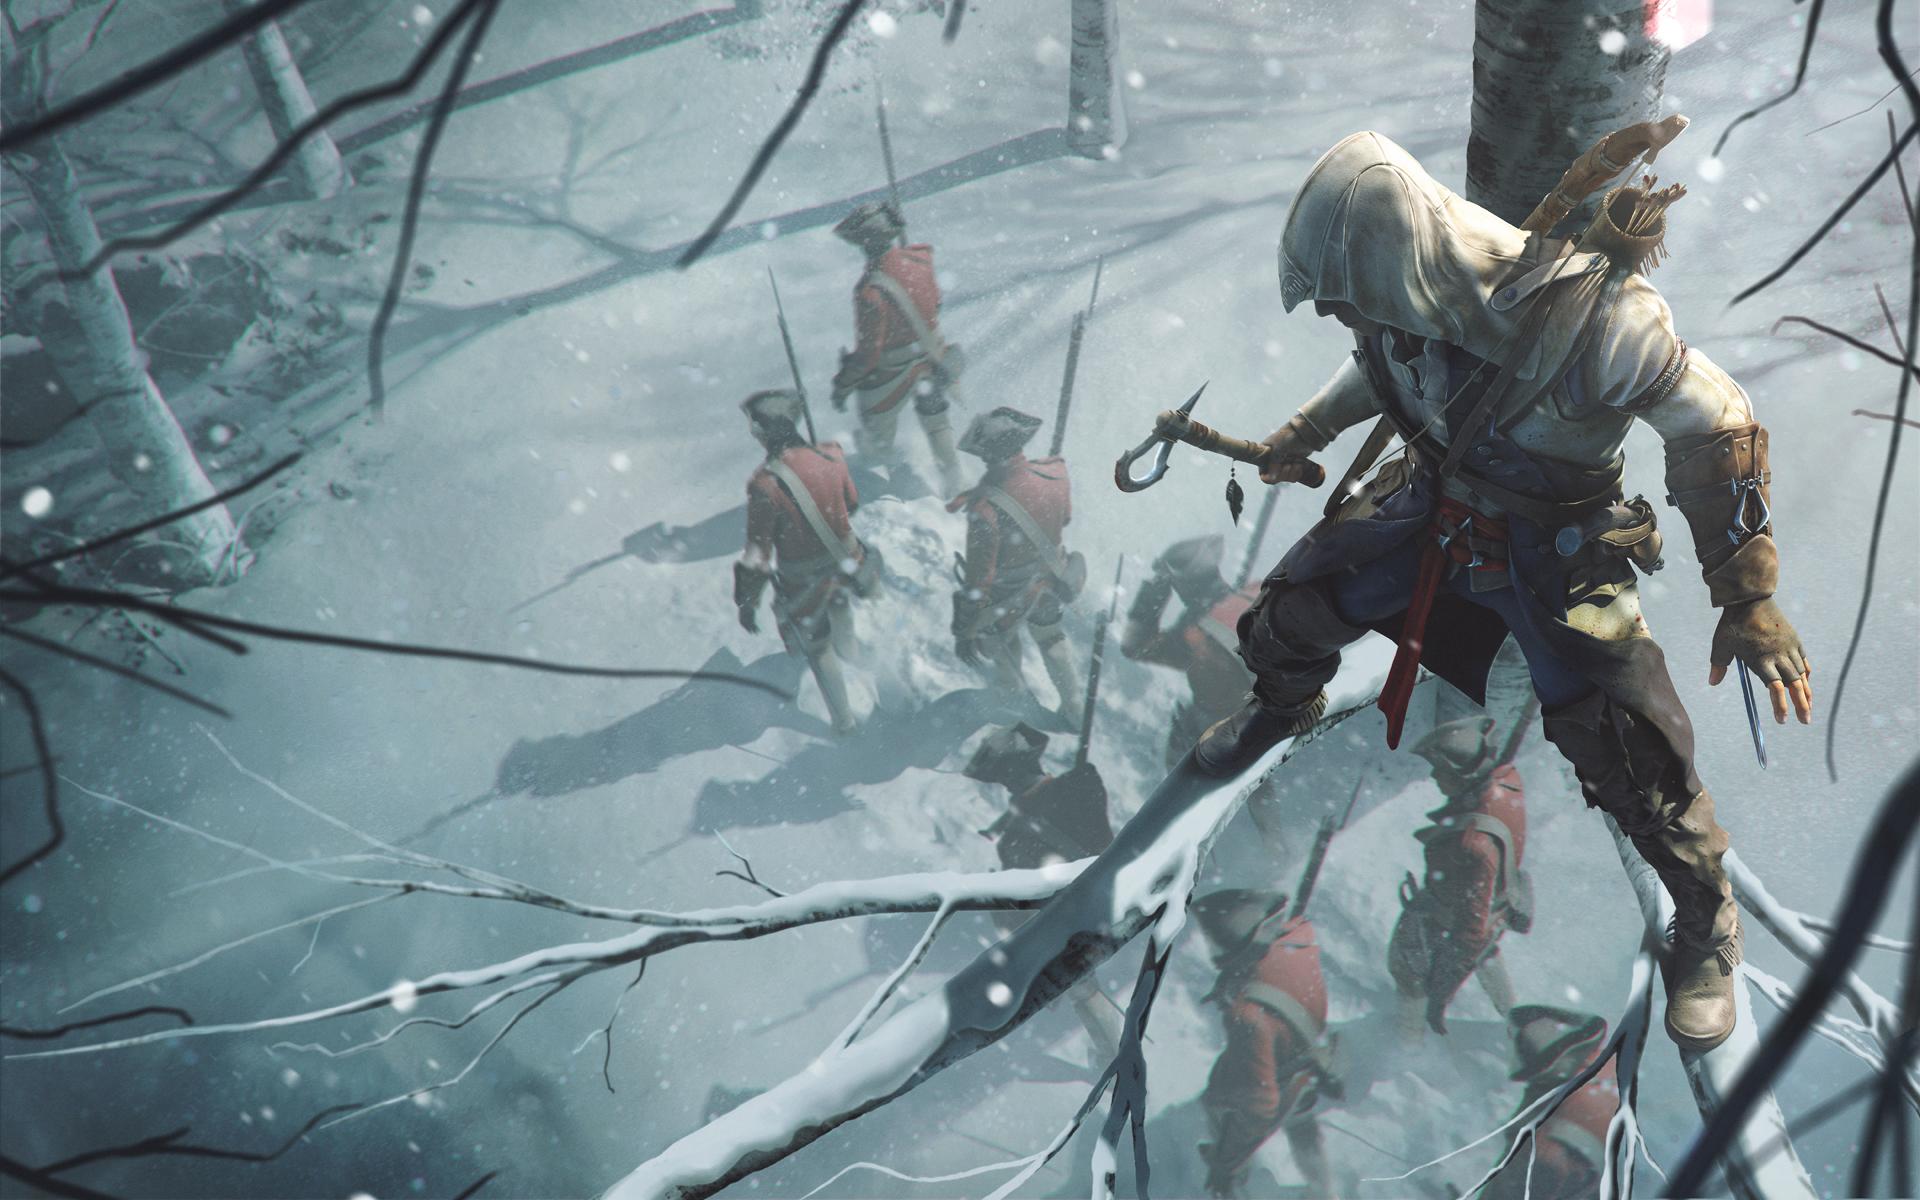 uPlay_PC_Wallpaper4_1920x1200.jpg - Assassin's Creed 3